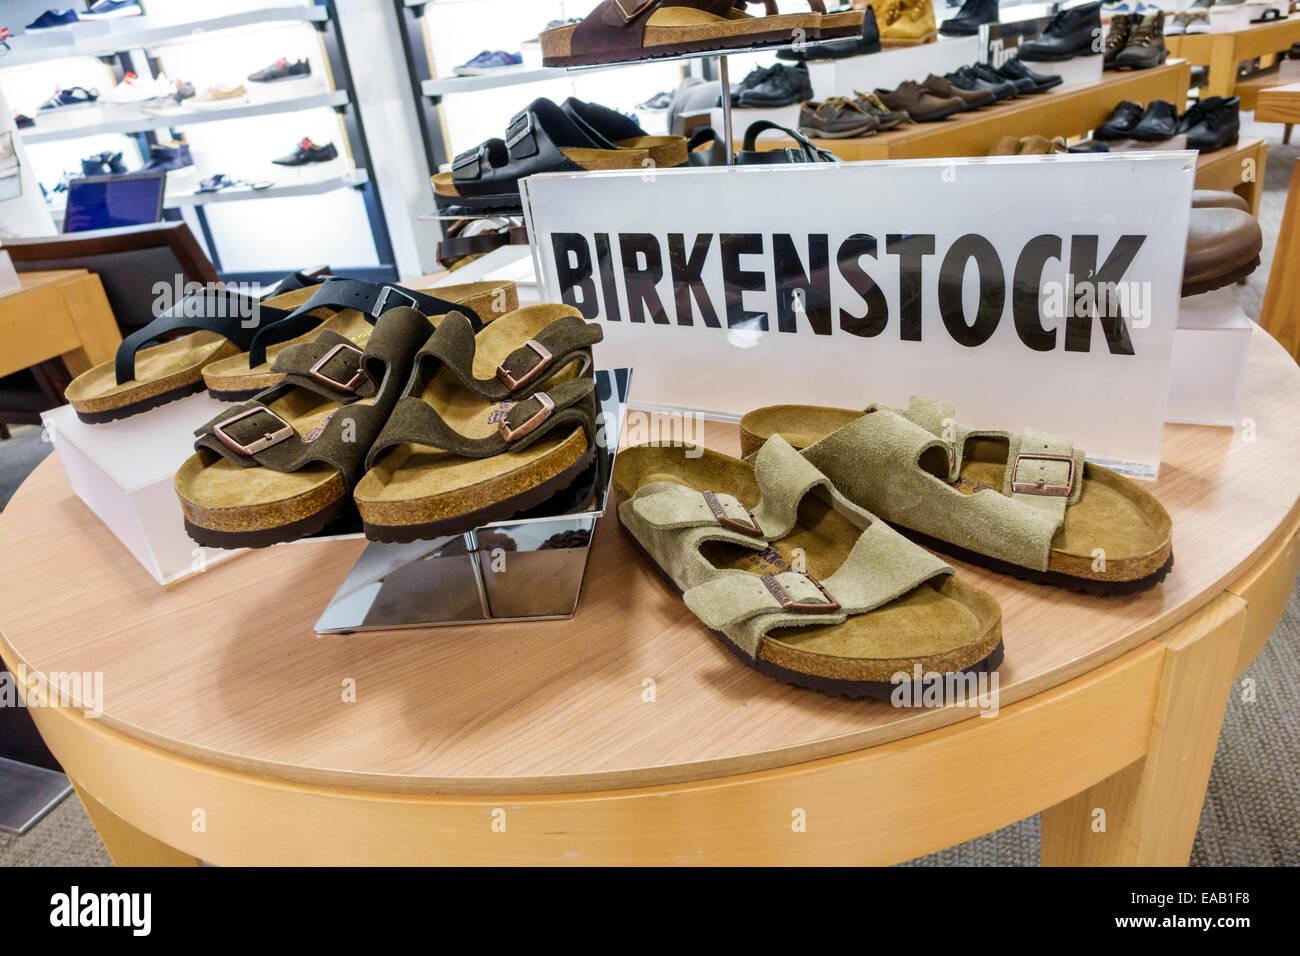 Miami Florida Macy's department store shopping inside sale display sandals fashion Birkenstock men's - Stock Image